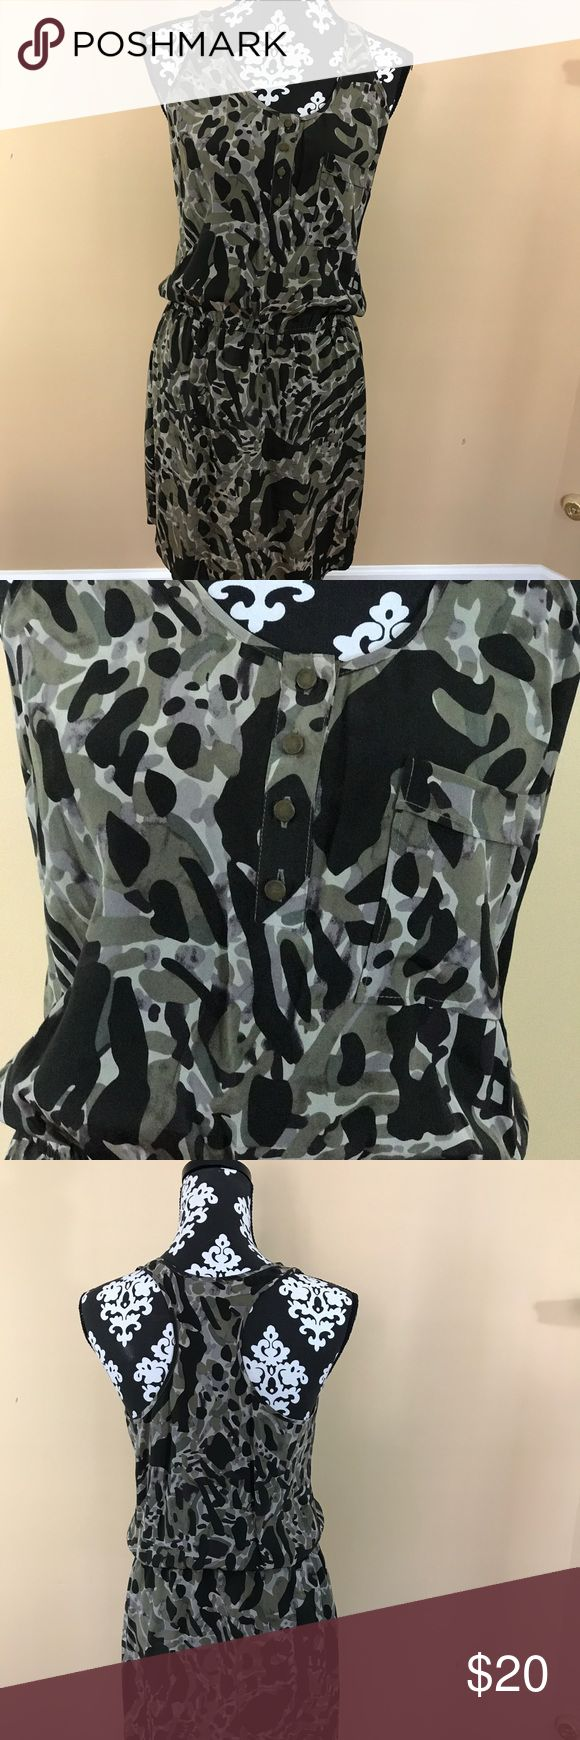 Charlie Jade drawstring dress Camouflage pattern dress with drawstring at waist. Size S Charlie Jade Dresses